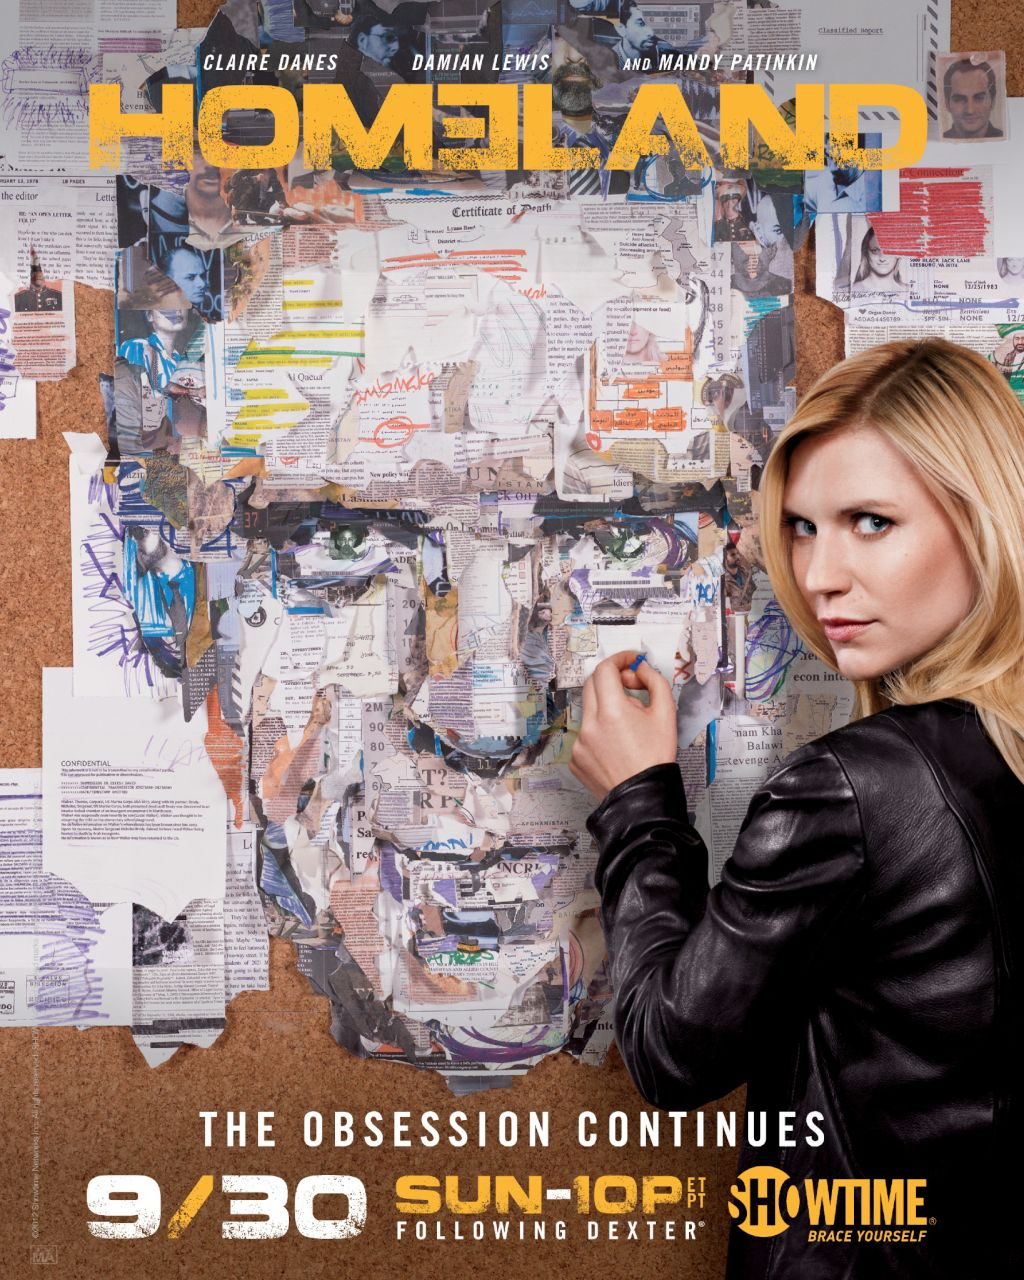 Homeland (Serie TV) - Página 2 Homeland-Poster-Obsesion